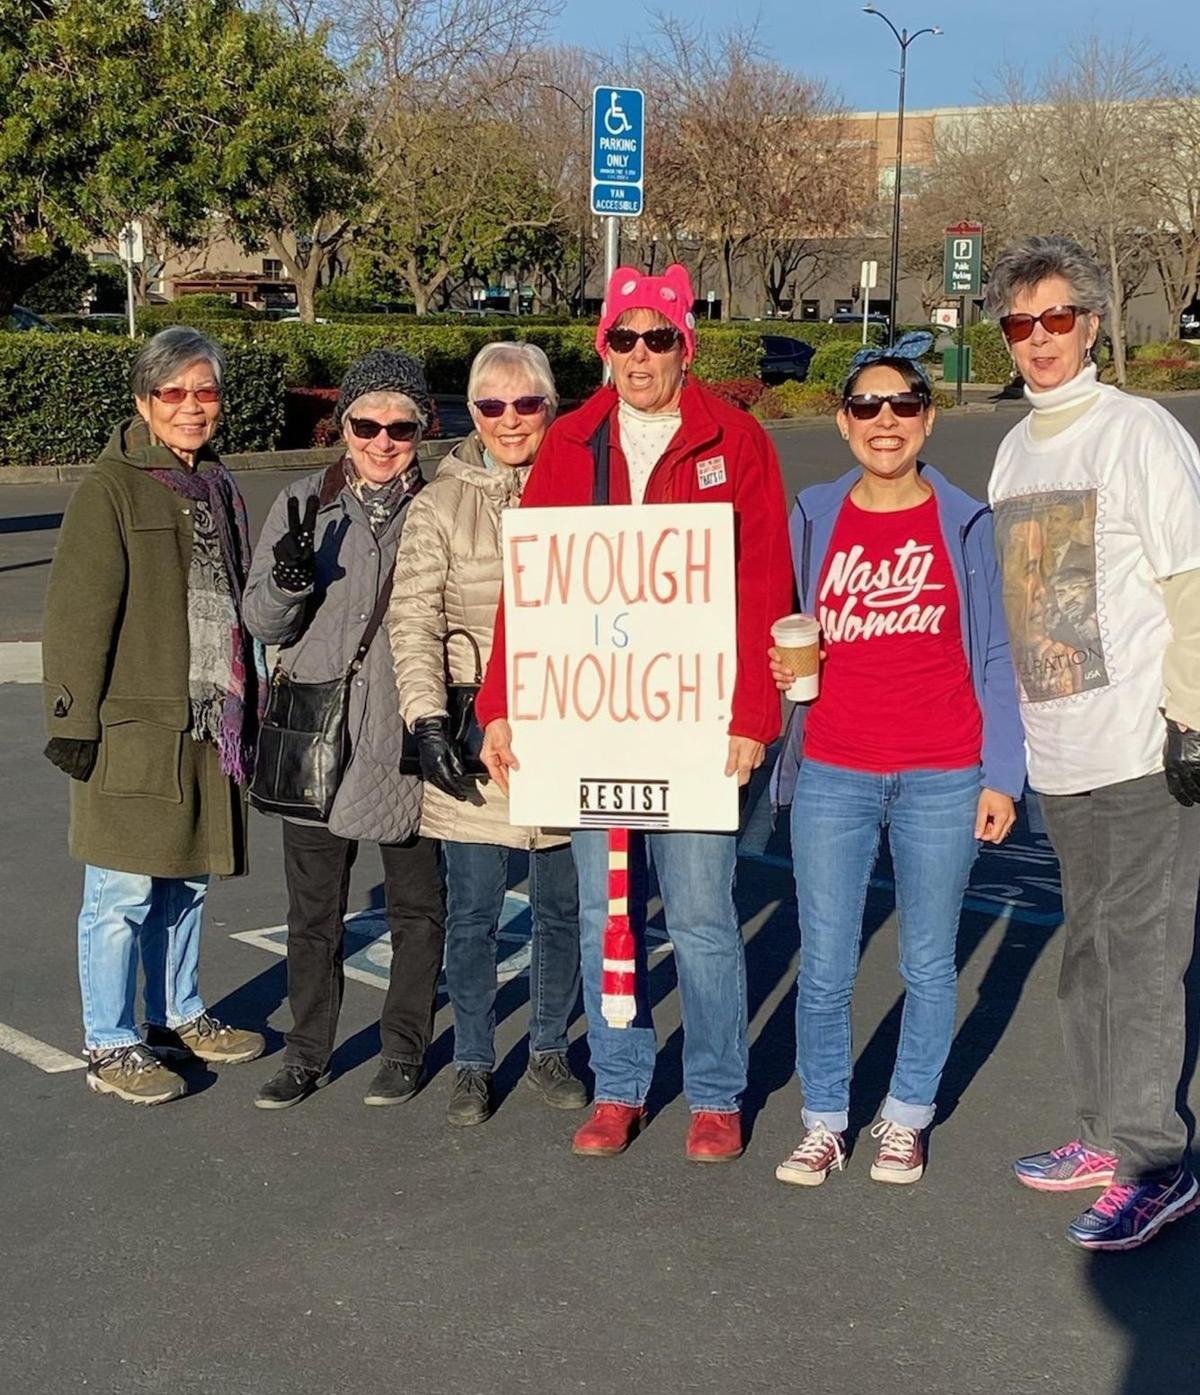 Upvalley Women's Marchers